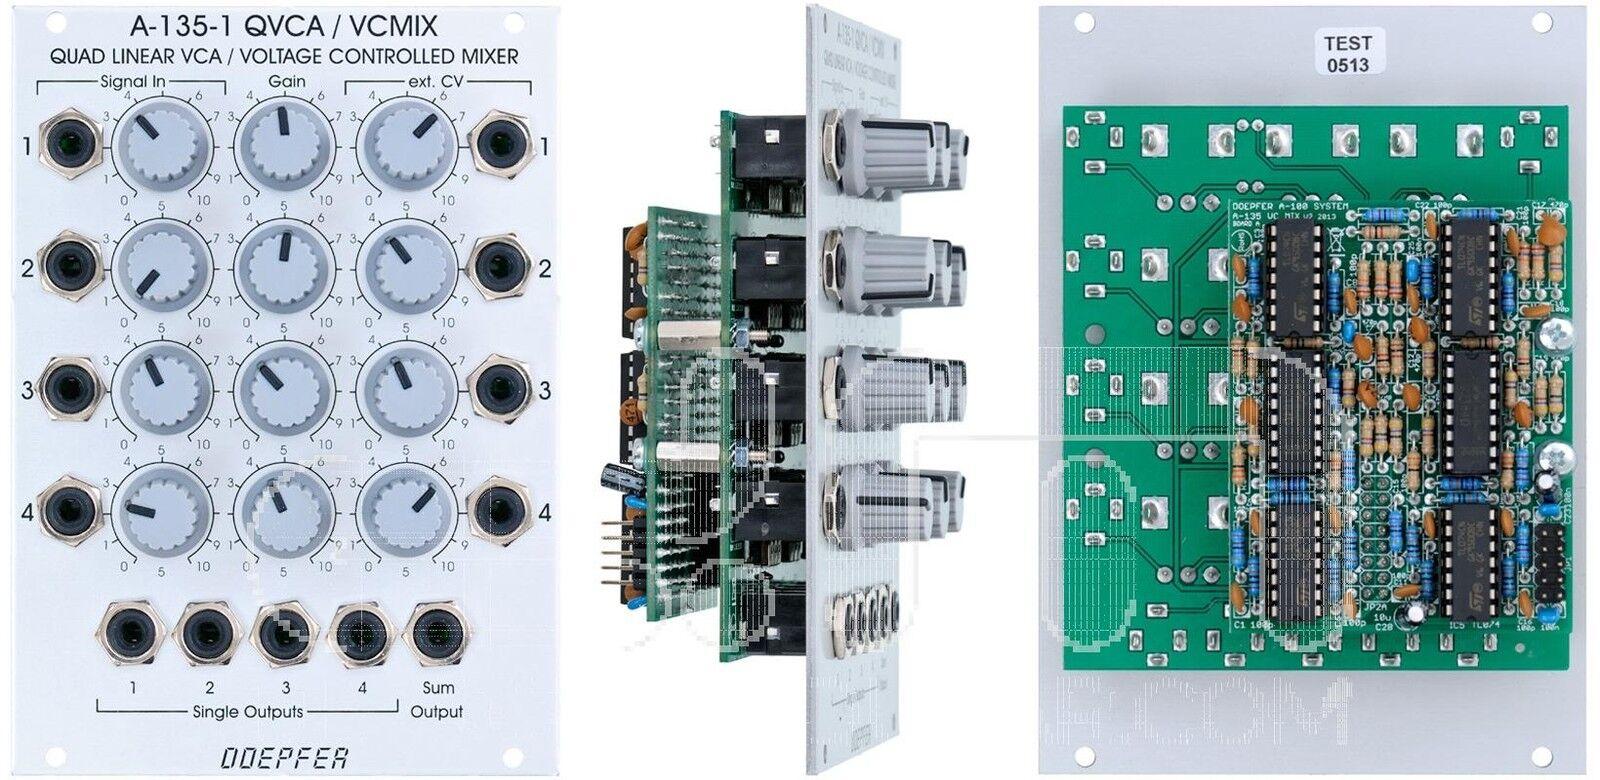 Doepfer A-135-1 Vc Mixer   Quad Vca   Eurorack  Nuova Detroit Modulare]